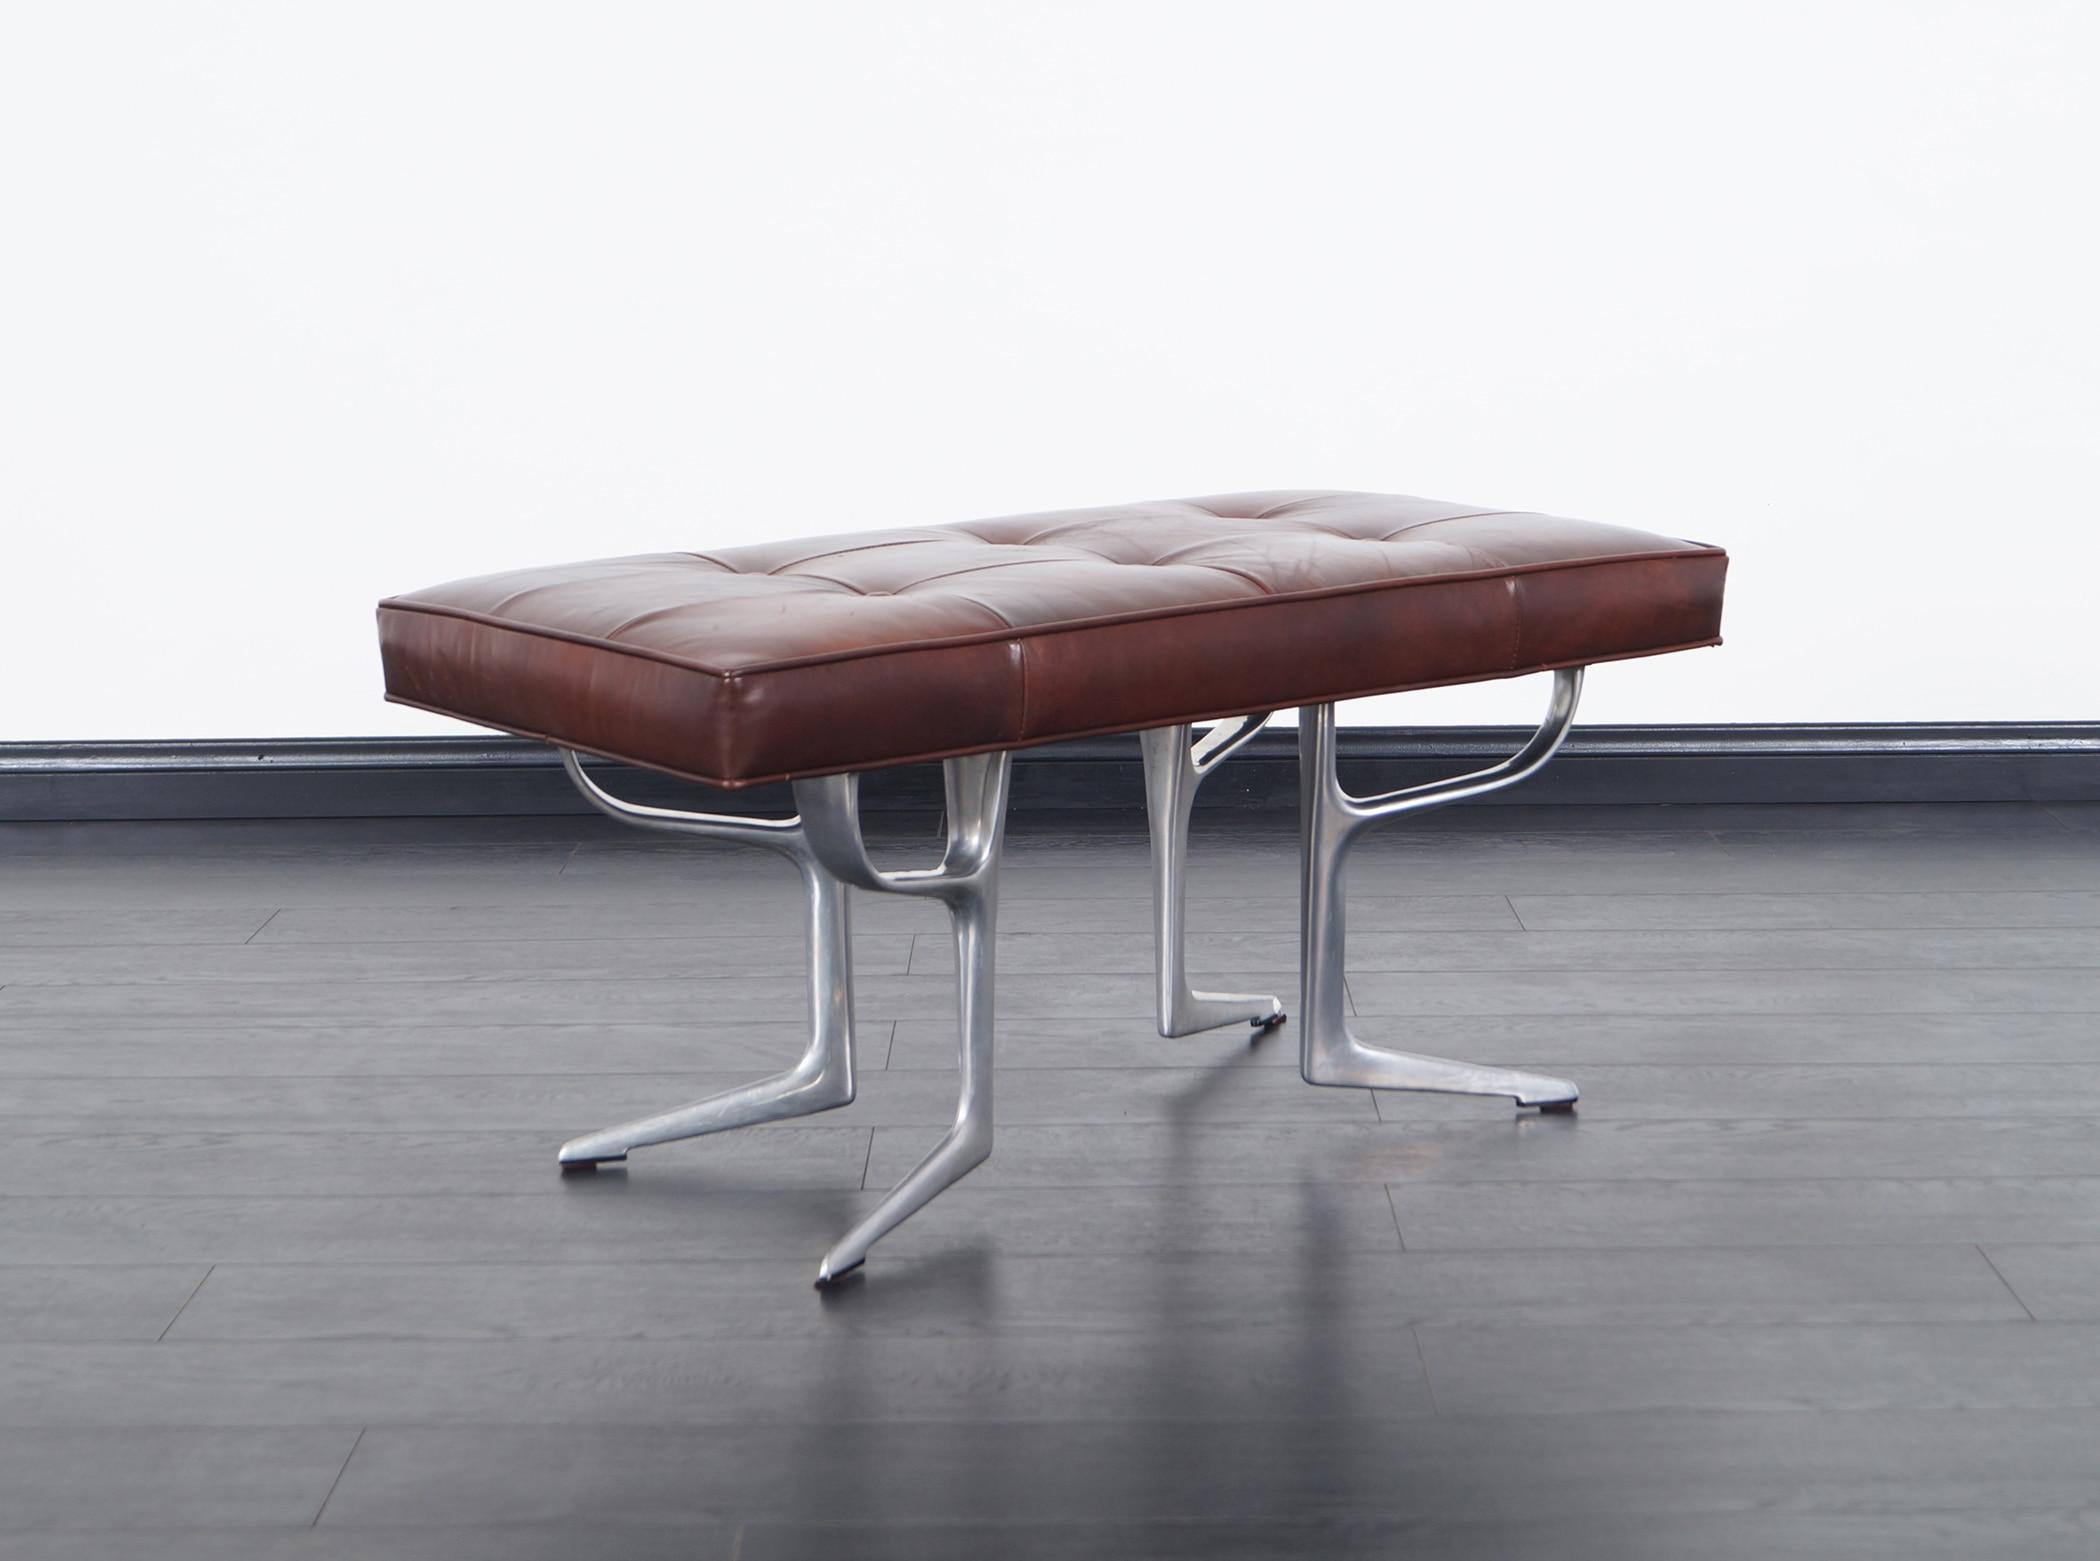 Vintage Sculptural Aluminum Bench